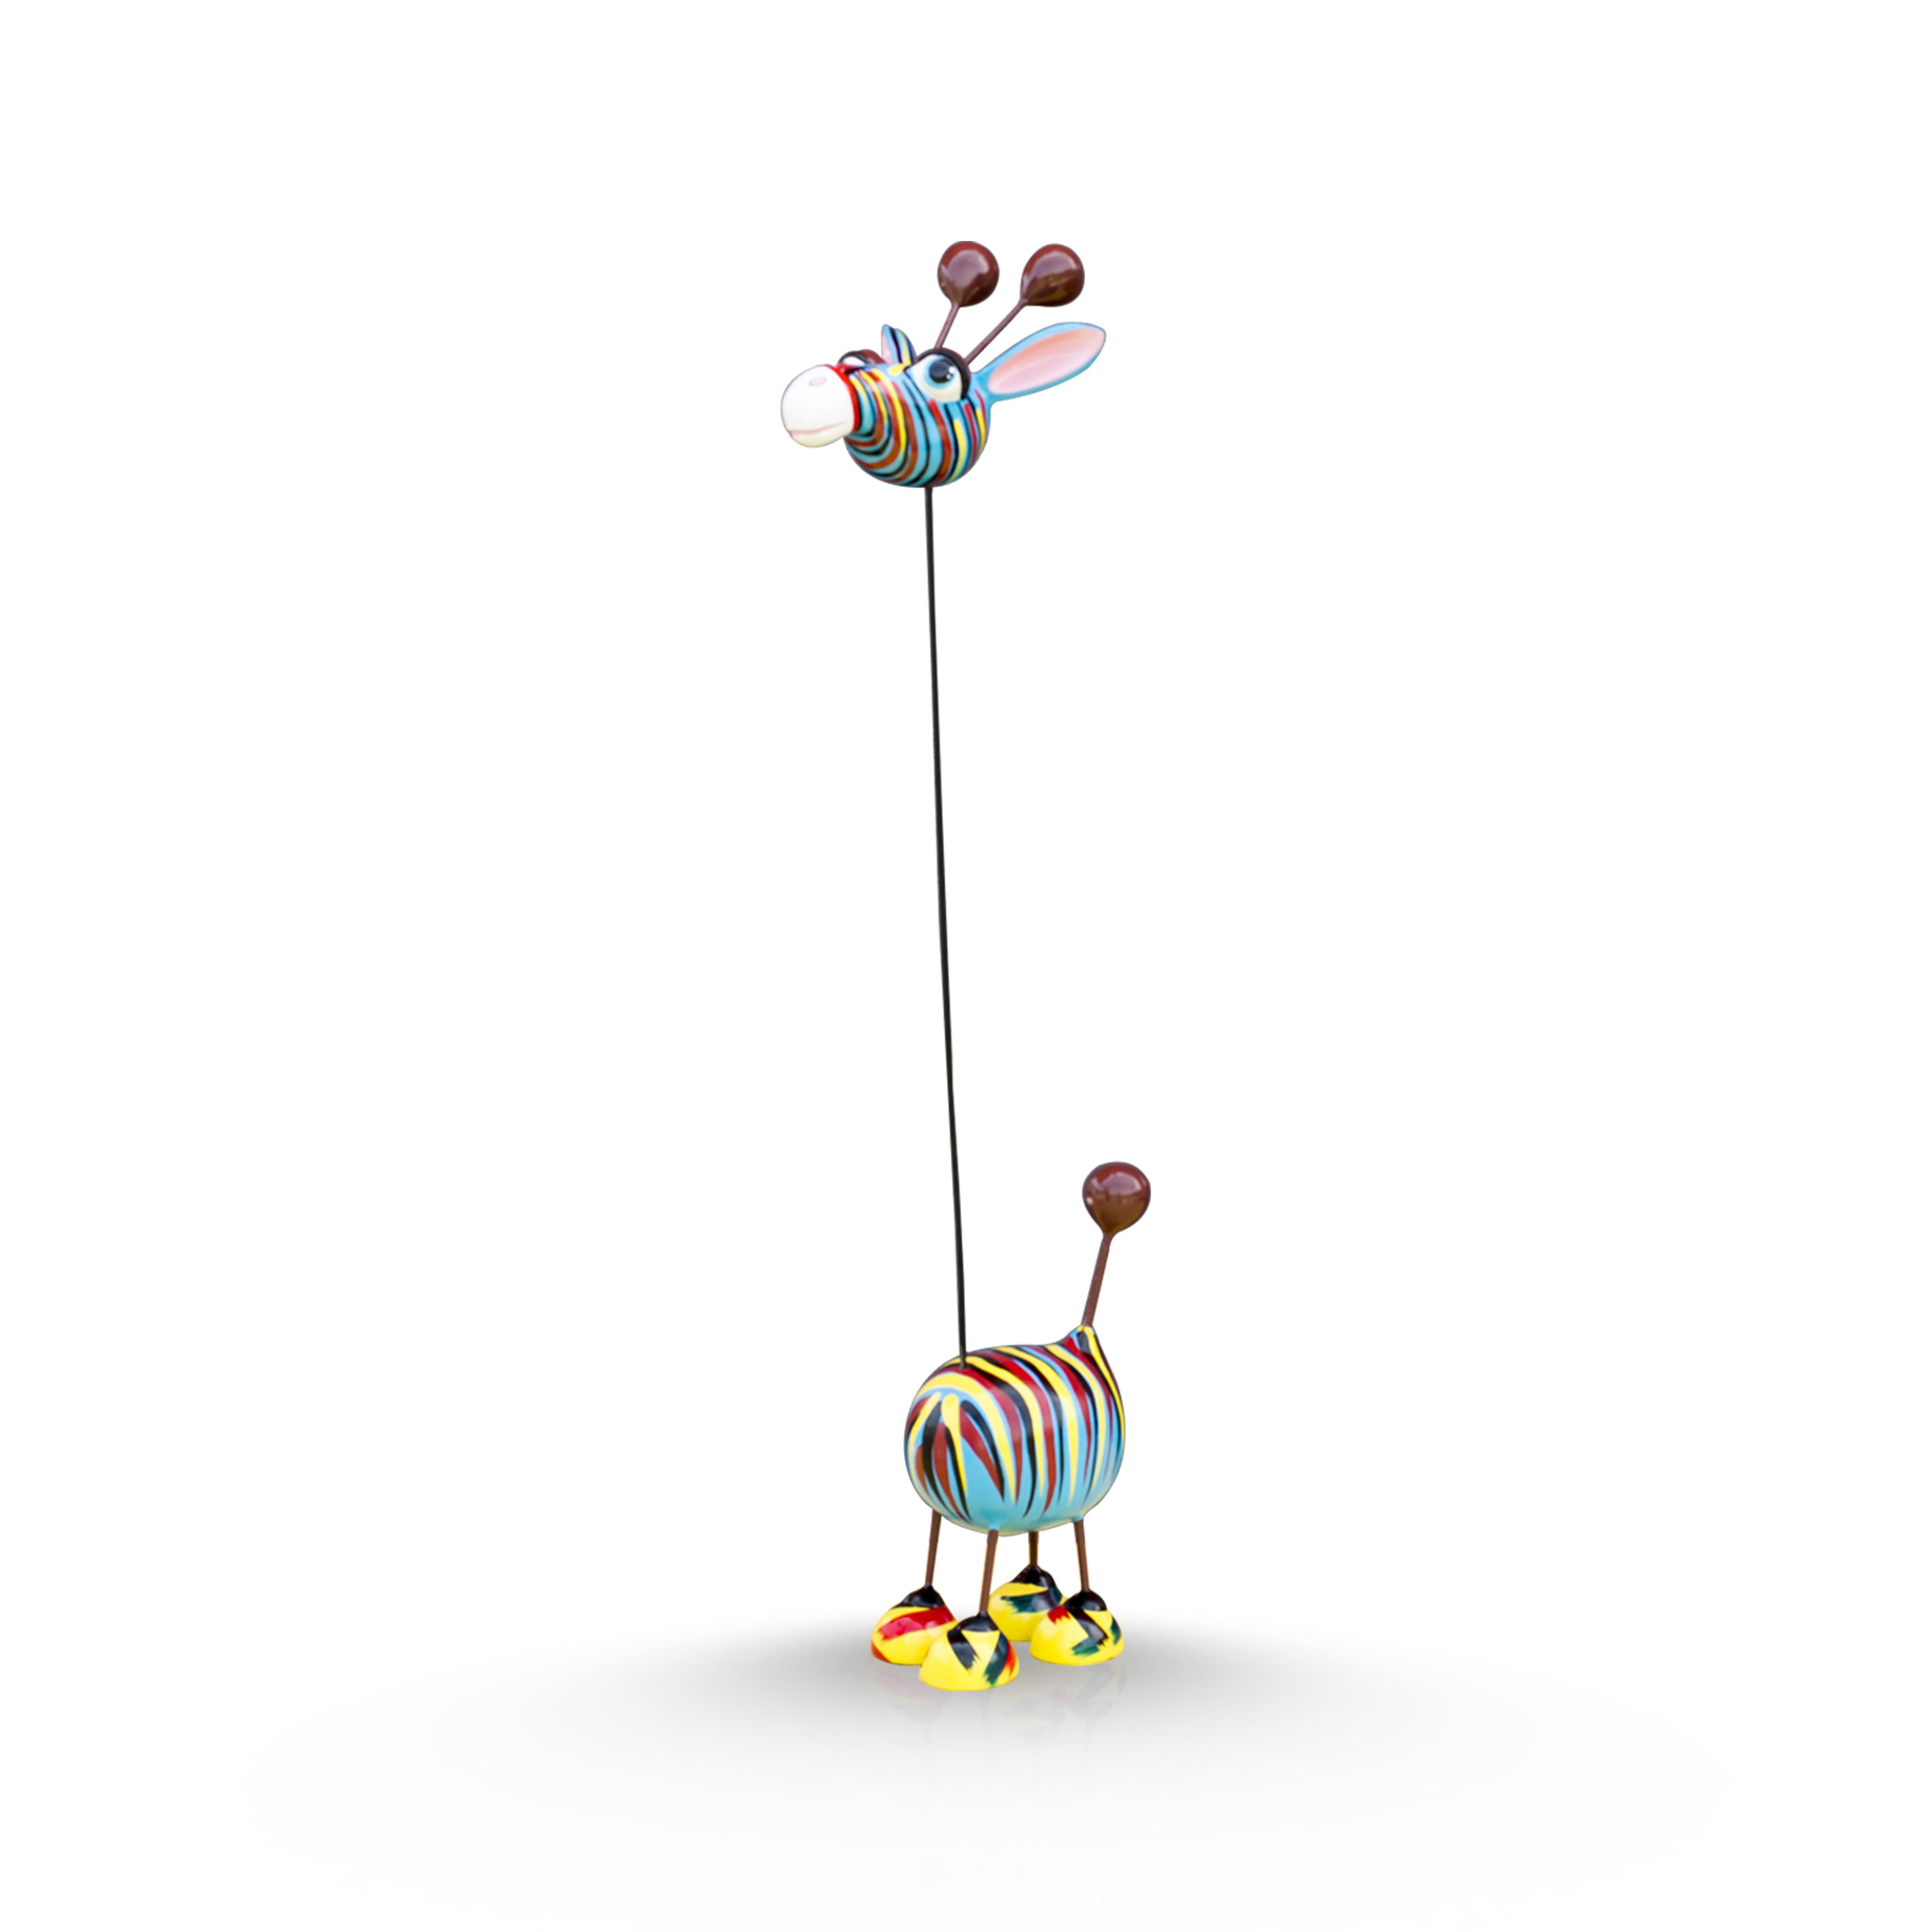 Mia Coppola Giraffe 'Andy Warhol' (M)